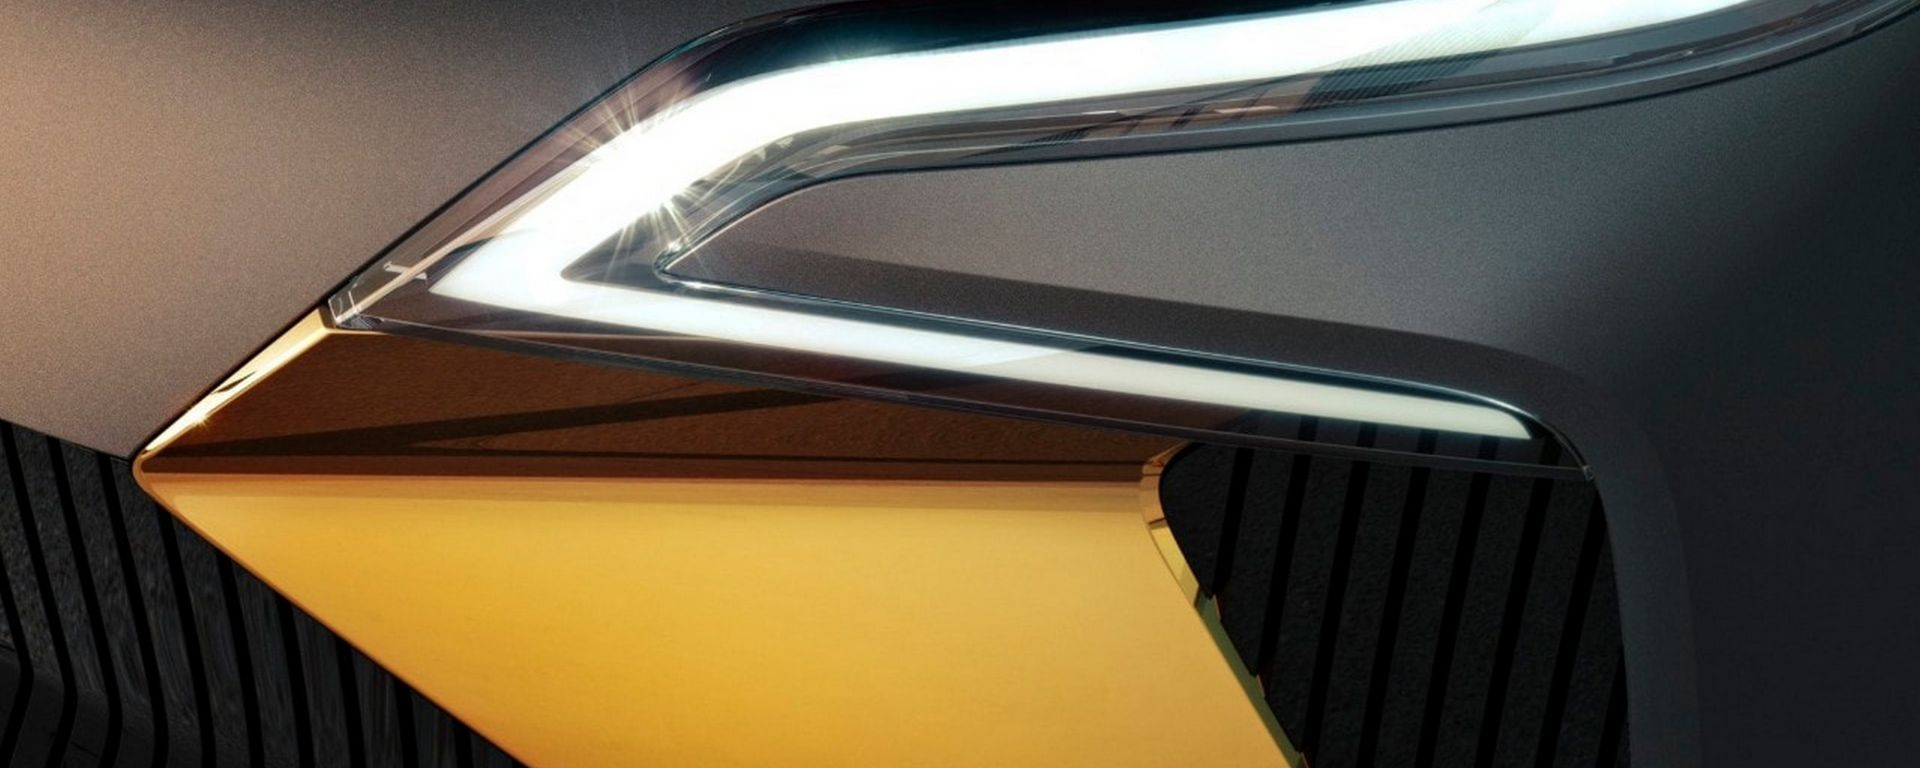 Renault eWays, il futuro elettrico secondo la Losanga